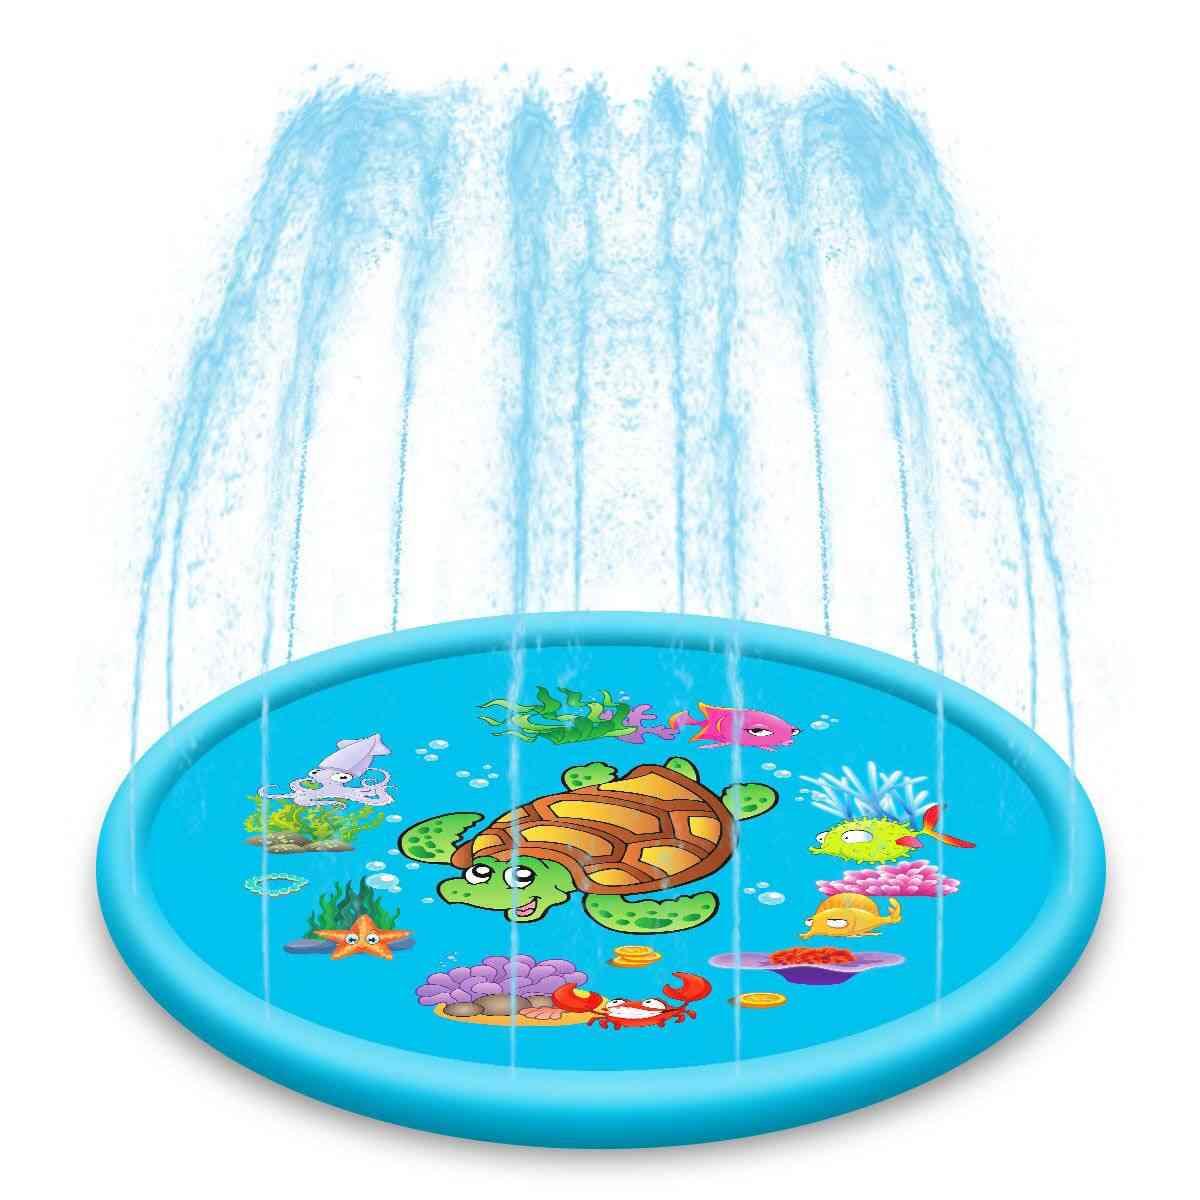 Folding Portable Sprinkler Water Play Mat